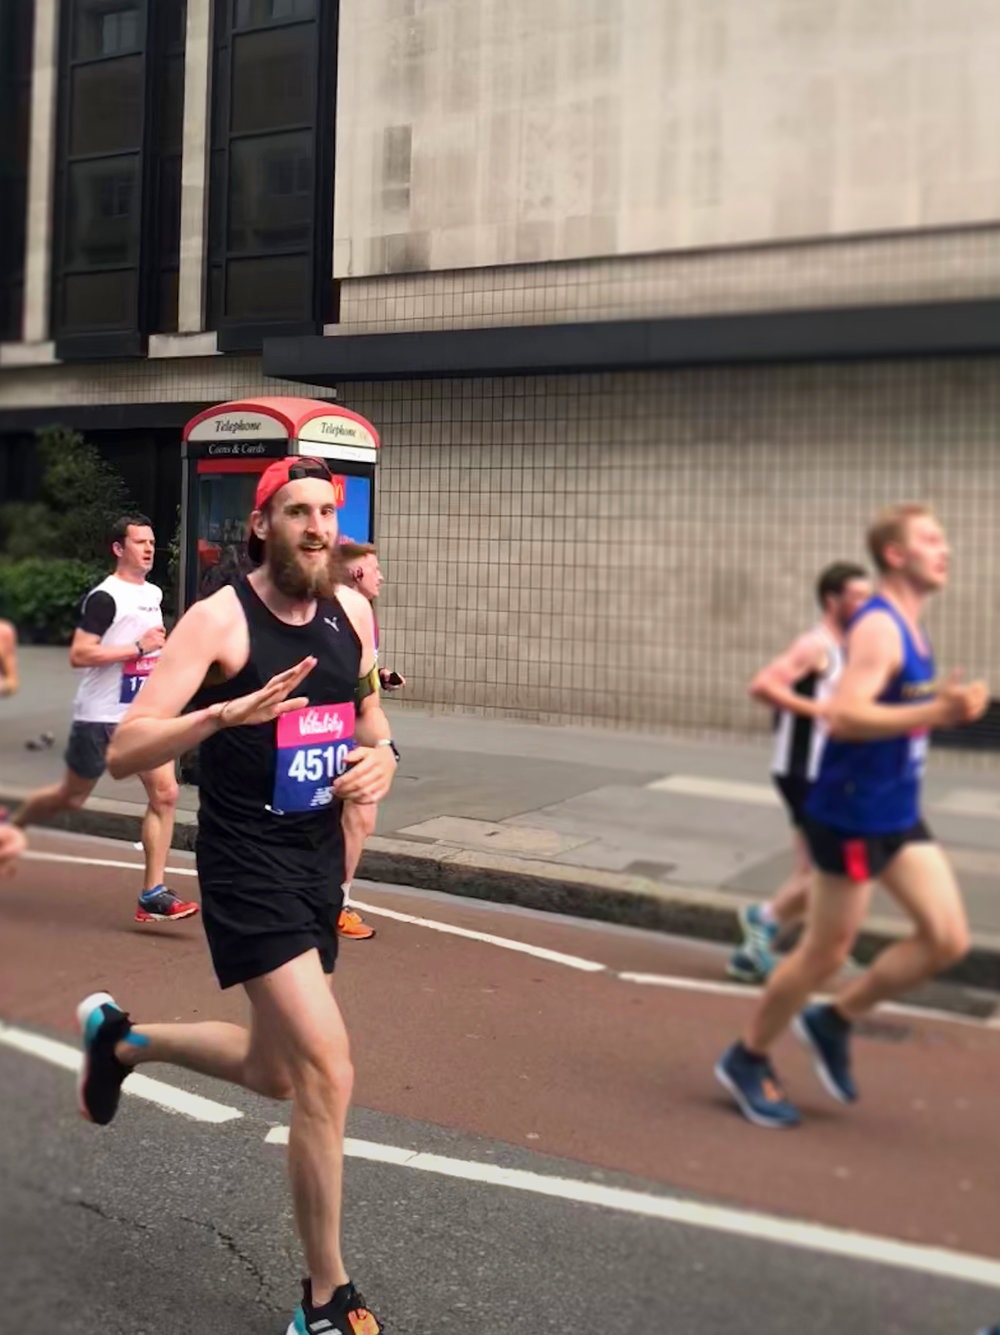 Vitality London 10000 - Mid Race Incline Assesment